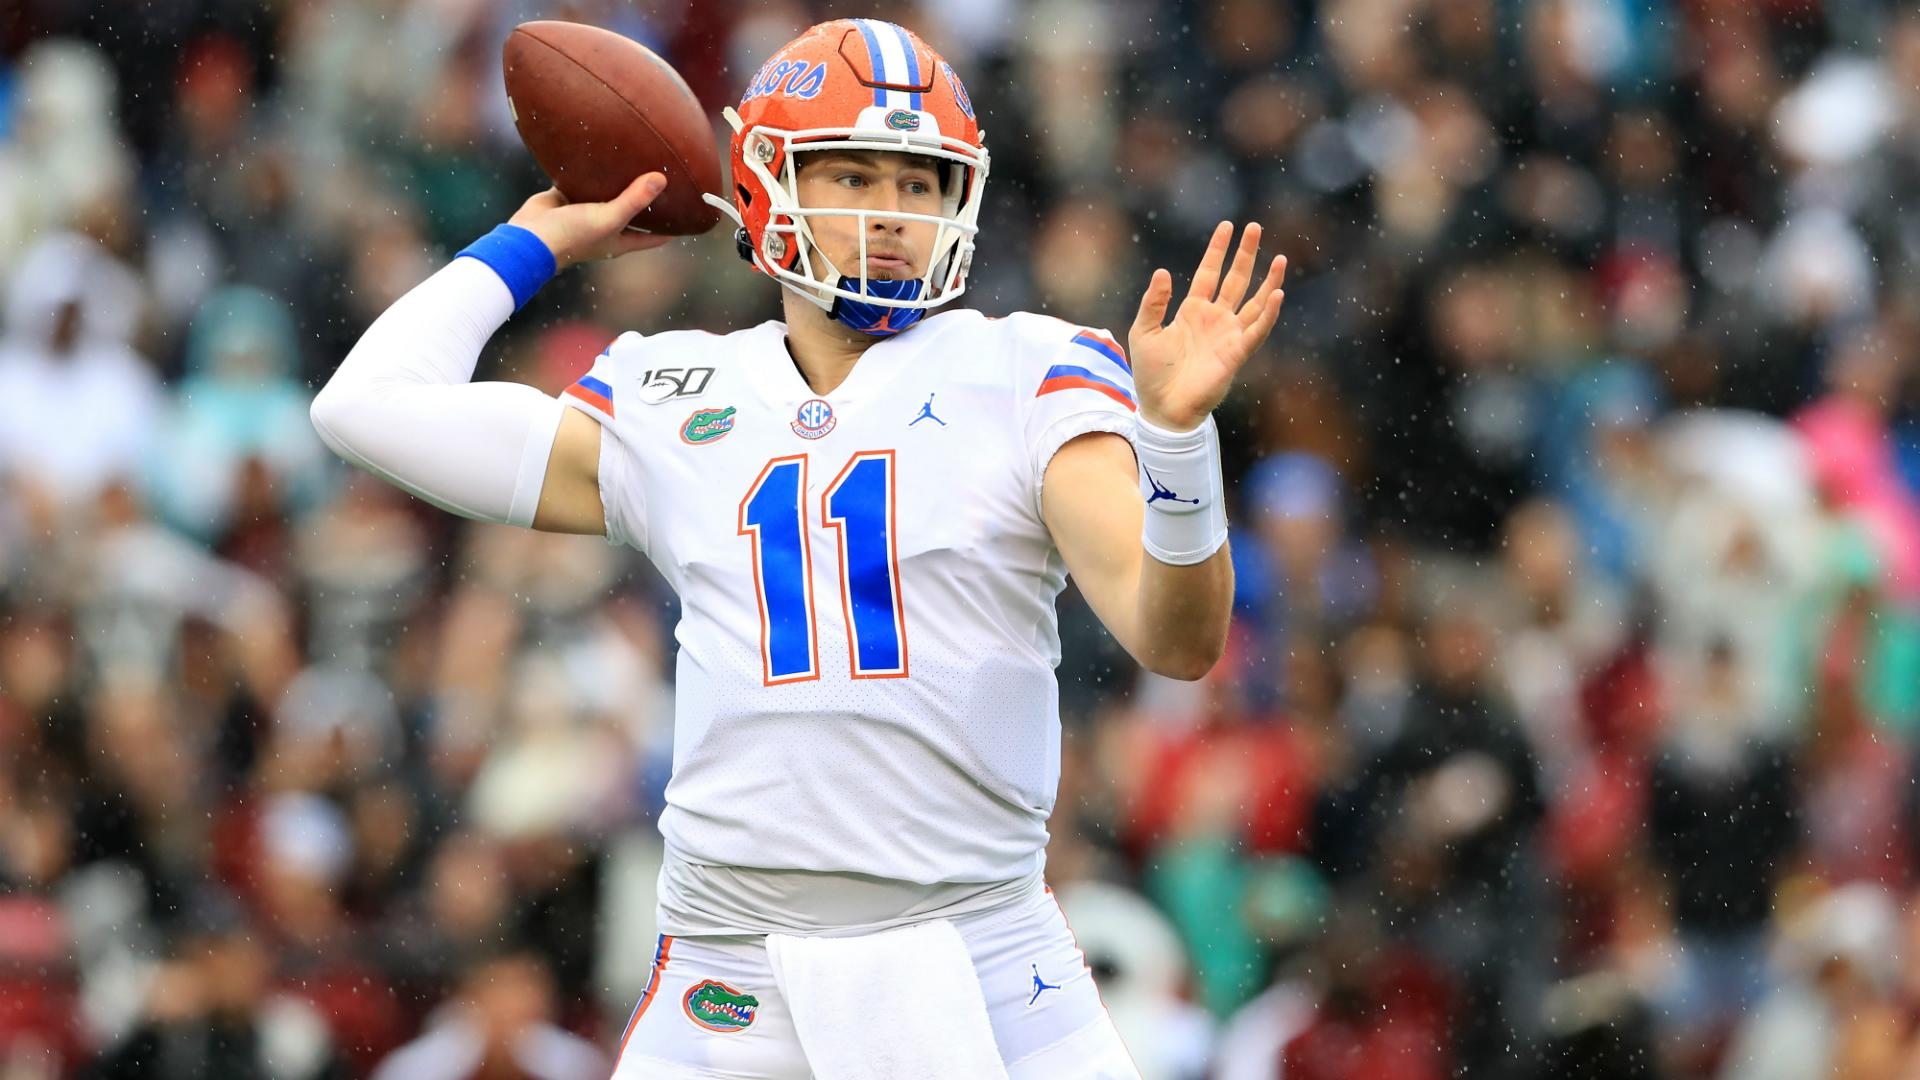 Patriots NFL Draft rumors: New England 'doing a lot of homework' on Florida QB Kyle Trask